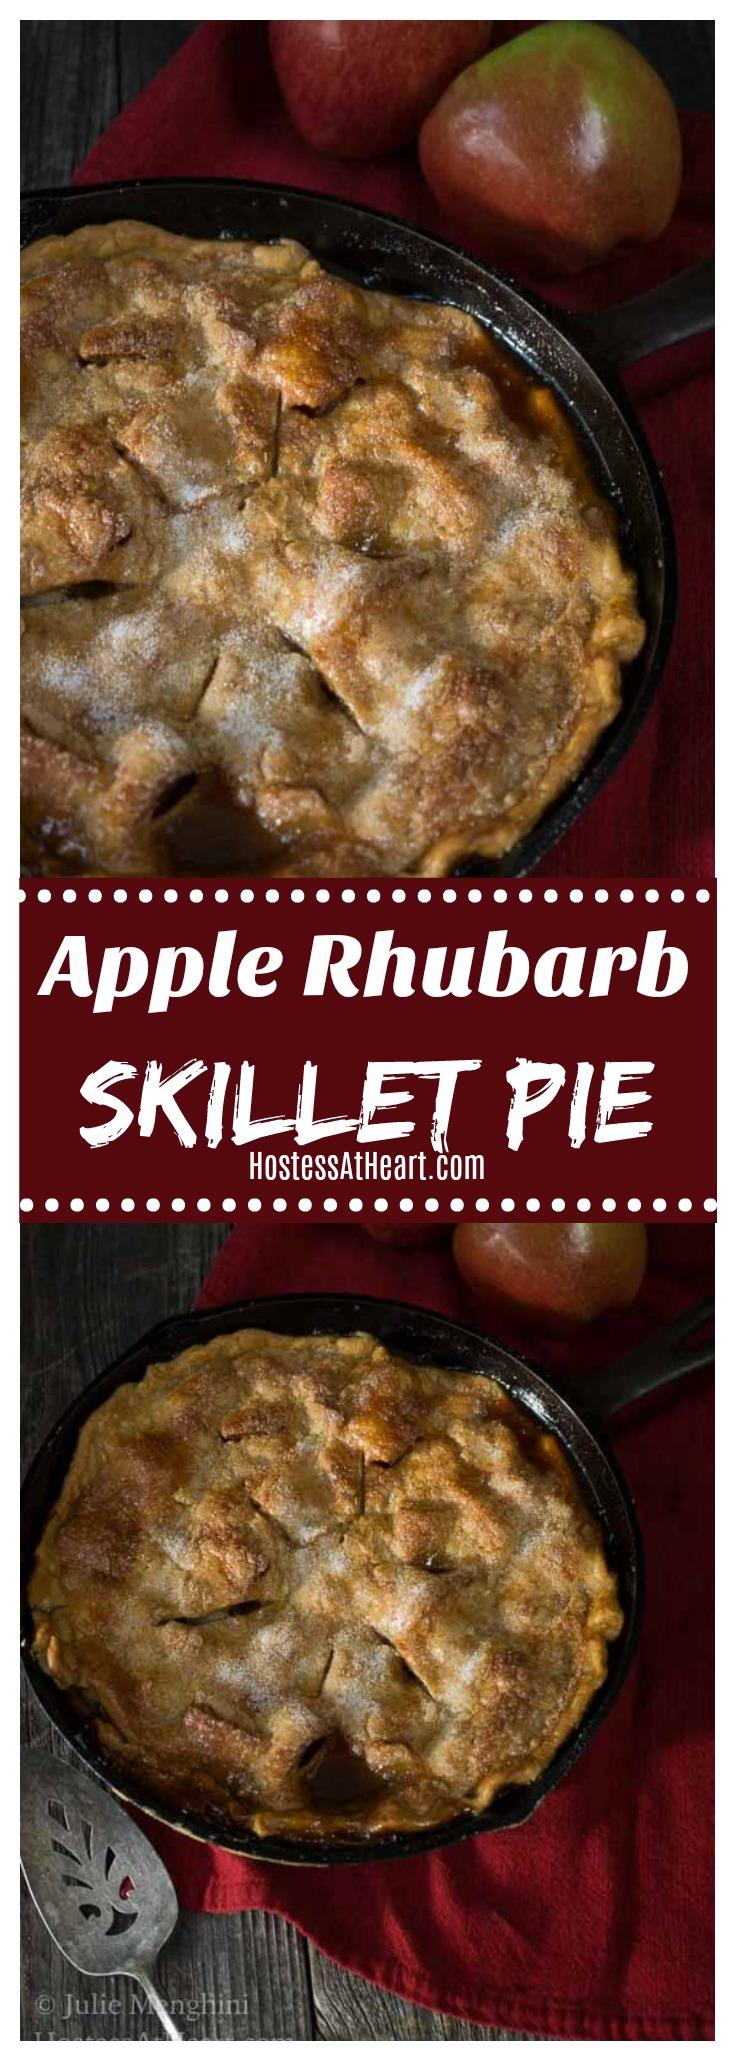 Pinterest collage of apple rhubarb skillet pie